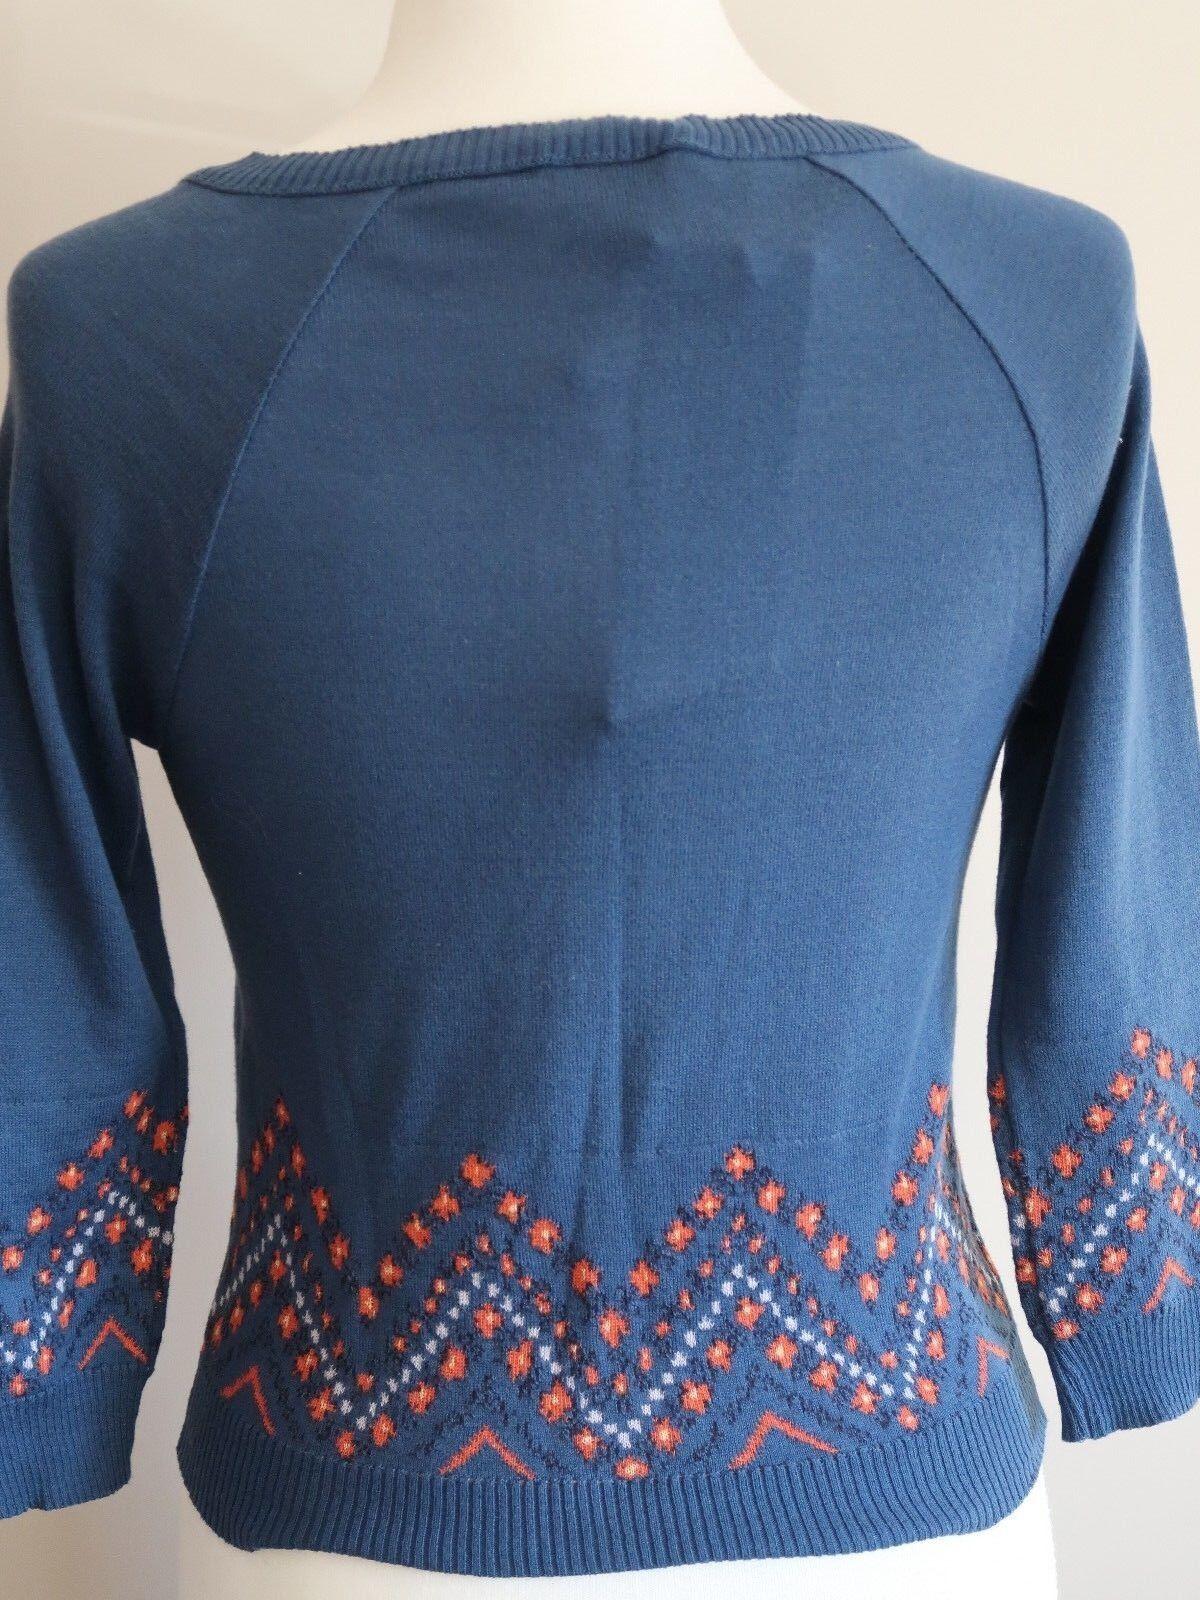 KATE MOSS TOPSHOP Liberty Stampa Cardigan US 6 EUR EUR EUR 38 NUOVO con etichetta ULTRA RARA 85cd6f